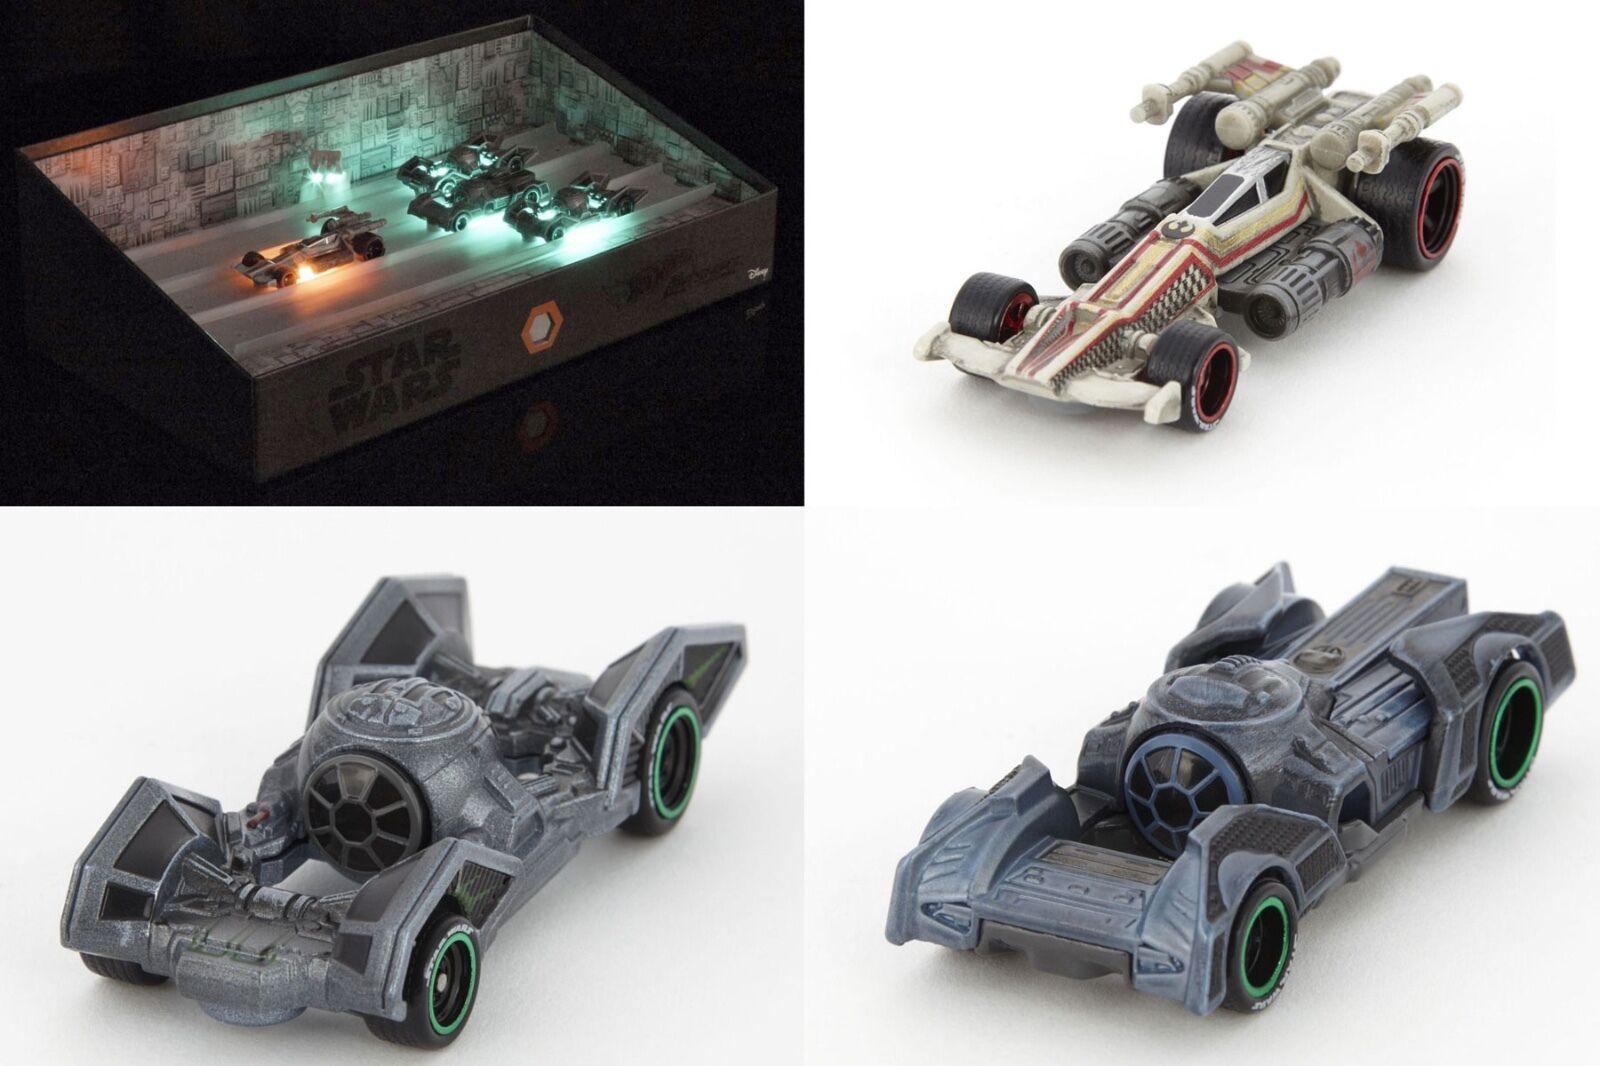 SDCC 2016 Mattel Exclusive  Hot Wheels - Star Wars Trench Run Car Ships, NEW MIB